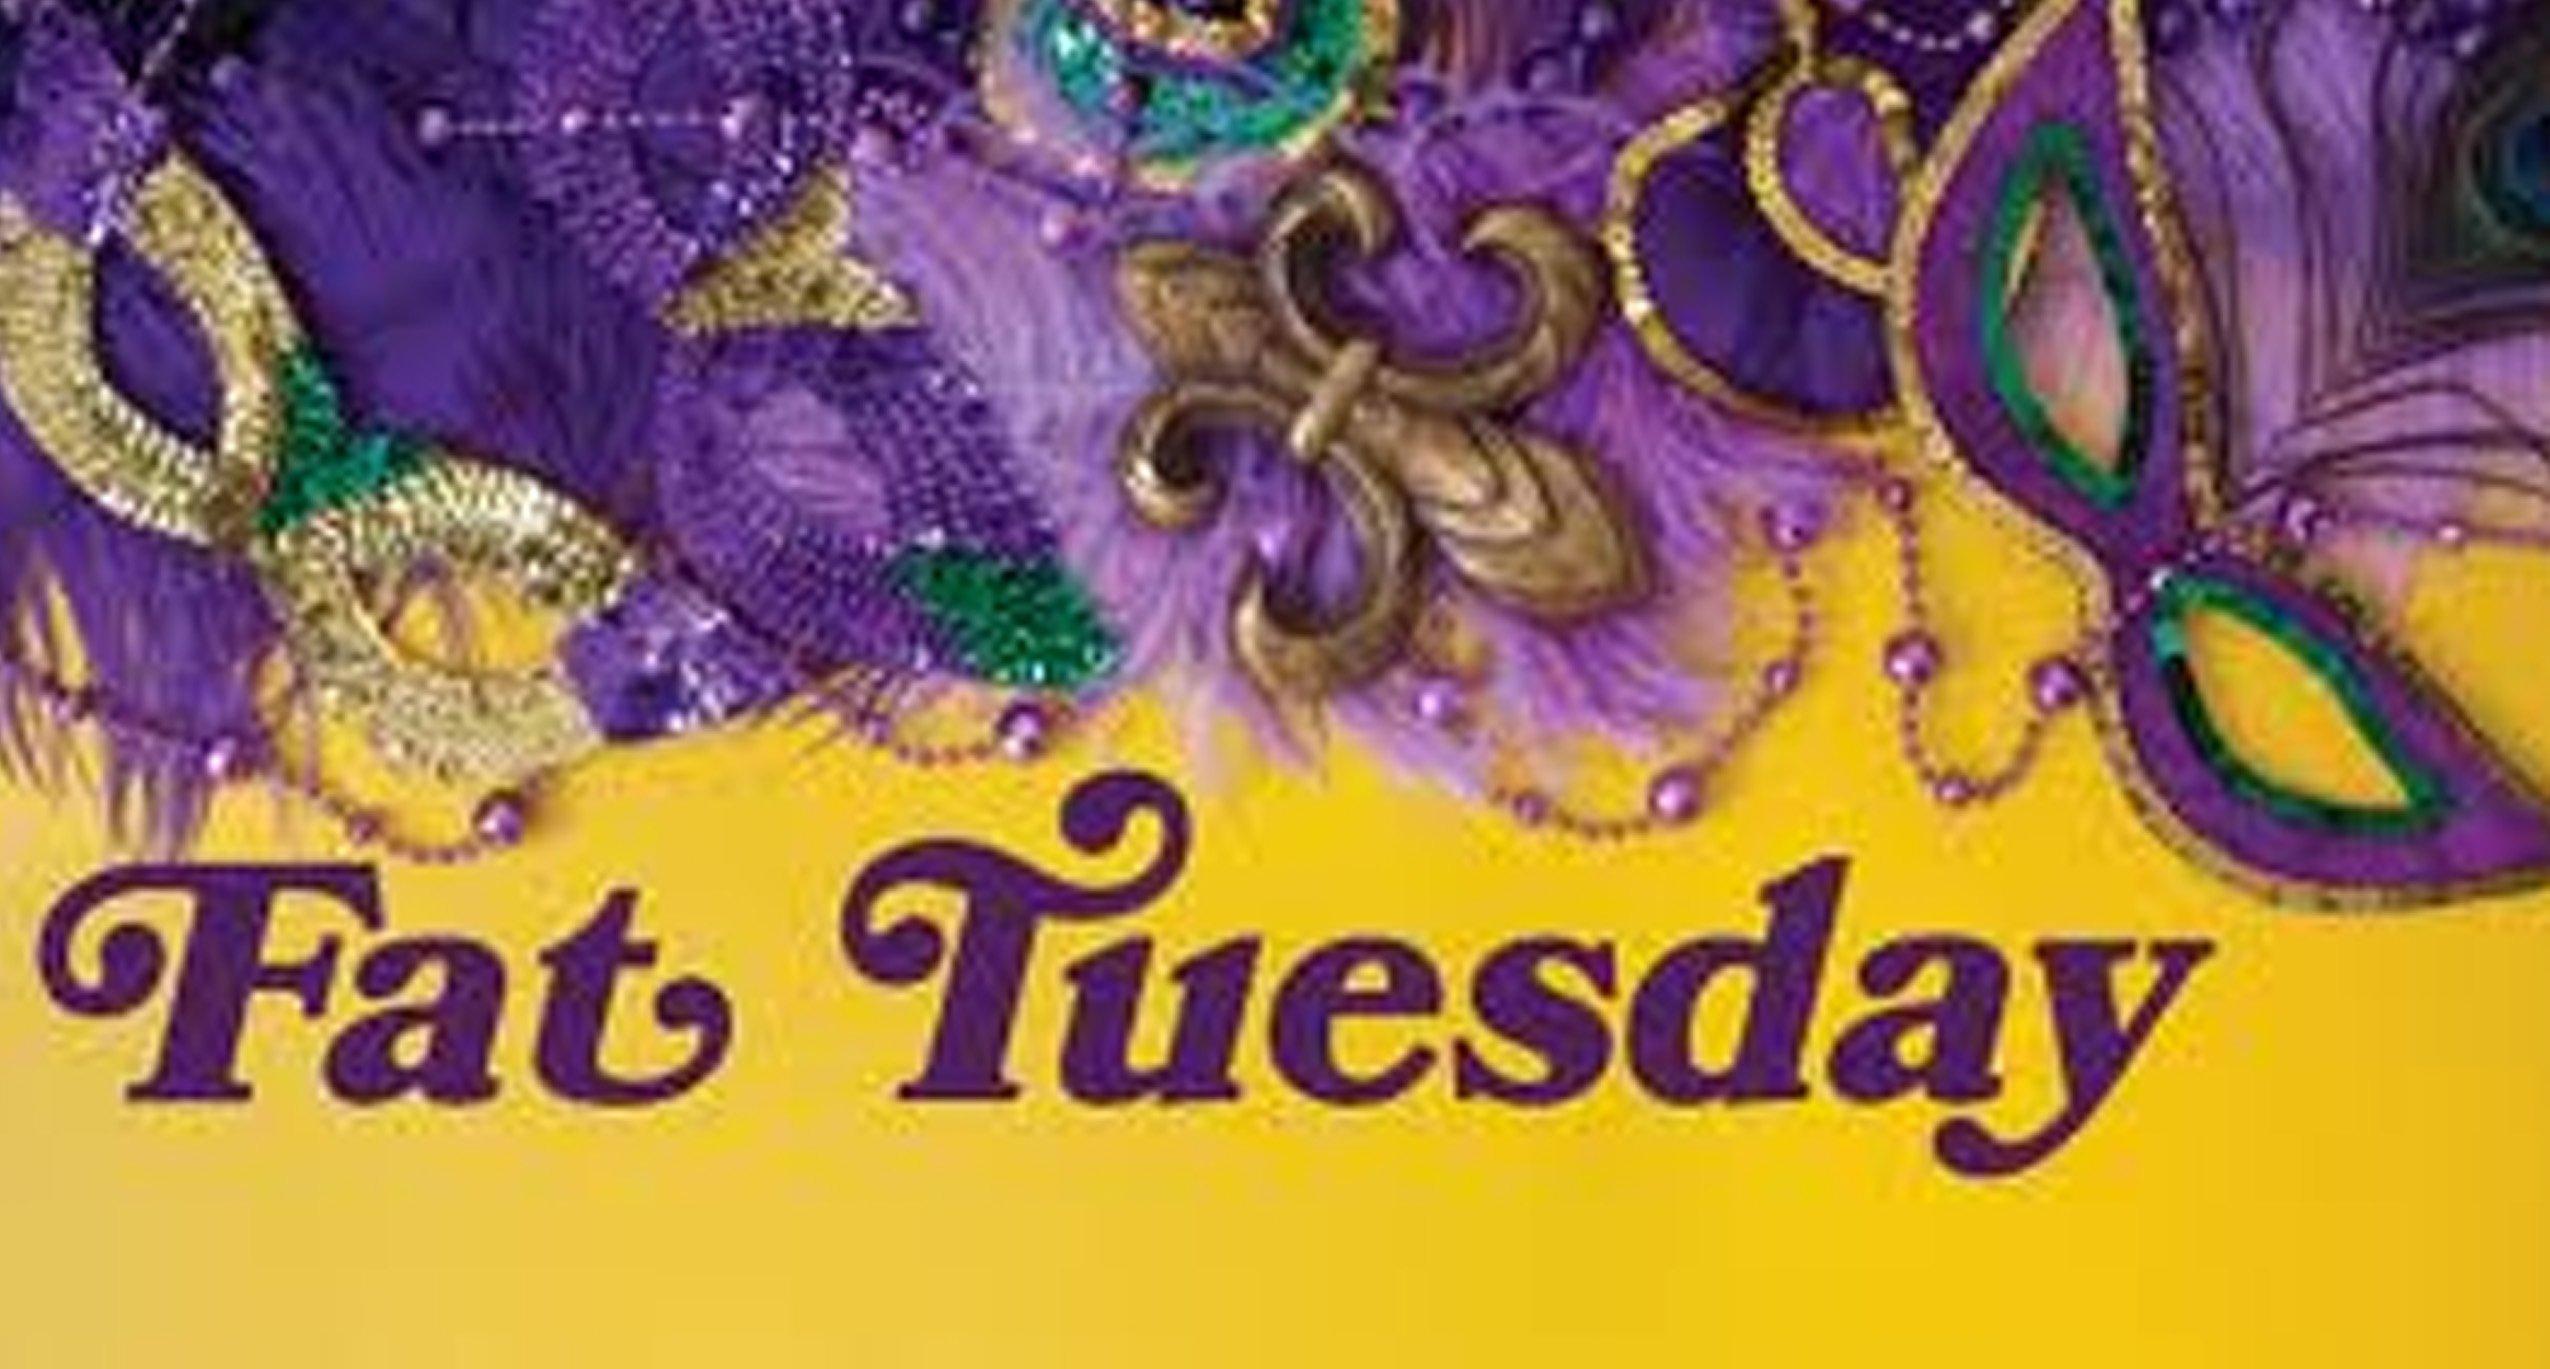 Its Fat Tuesday Shove Tuesday Mardi Gras Shrovetide A Celebration By Many Names